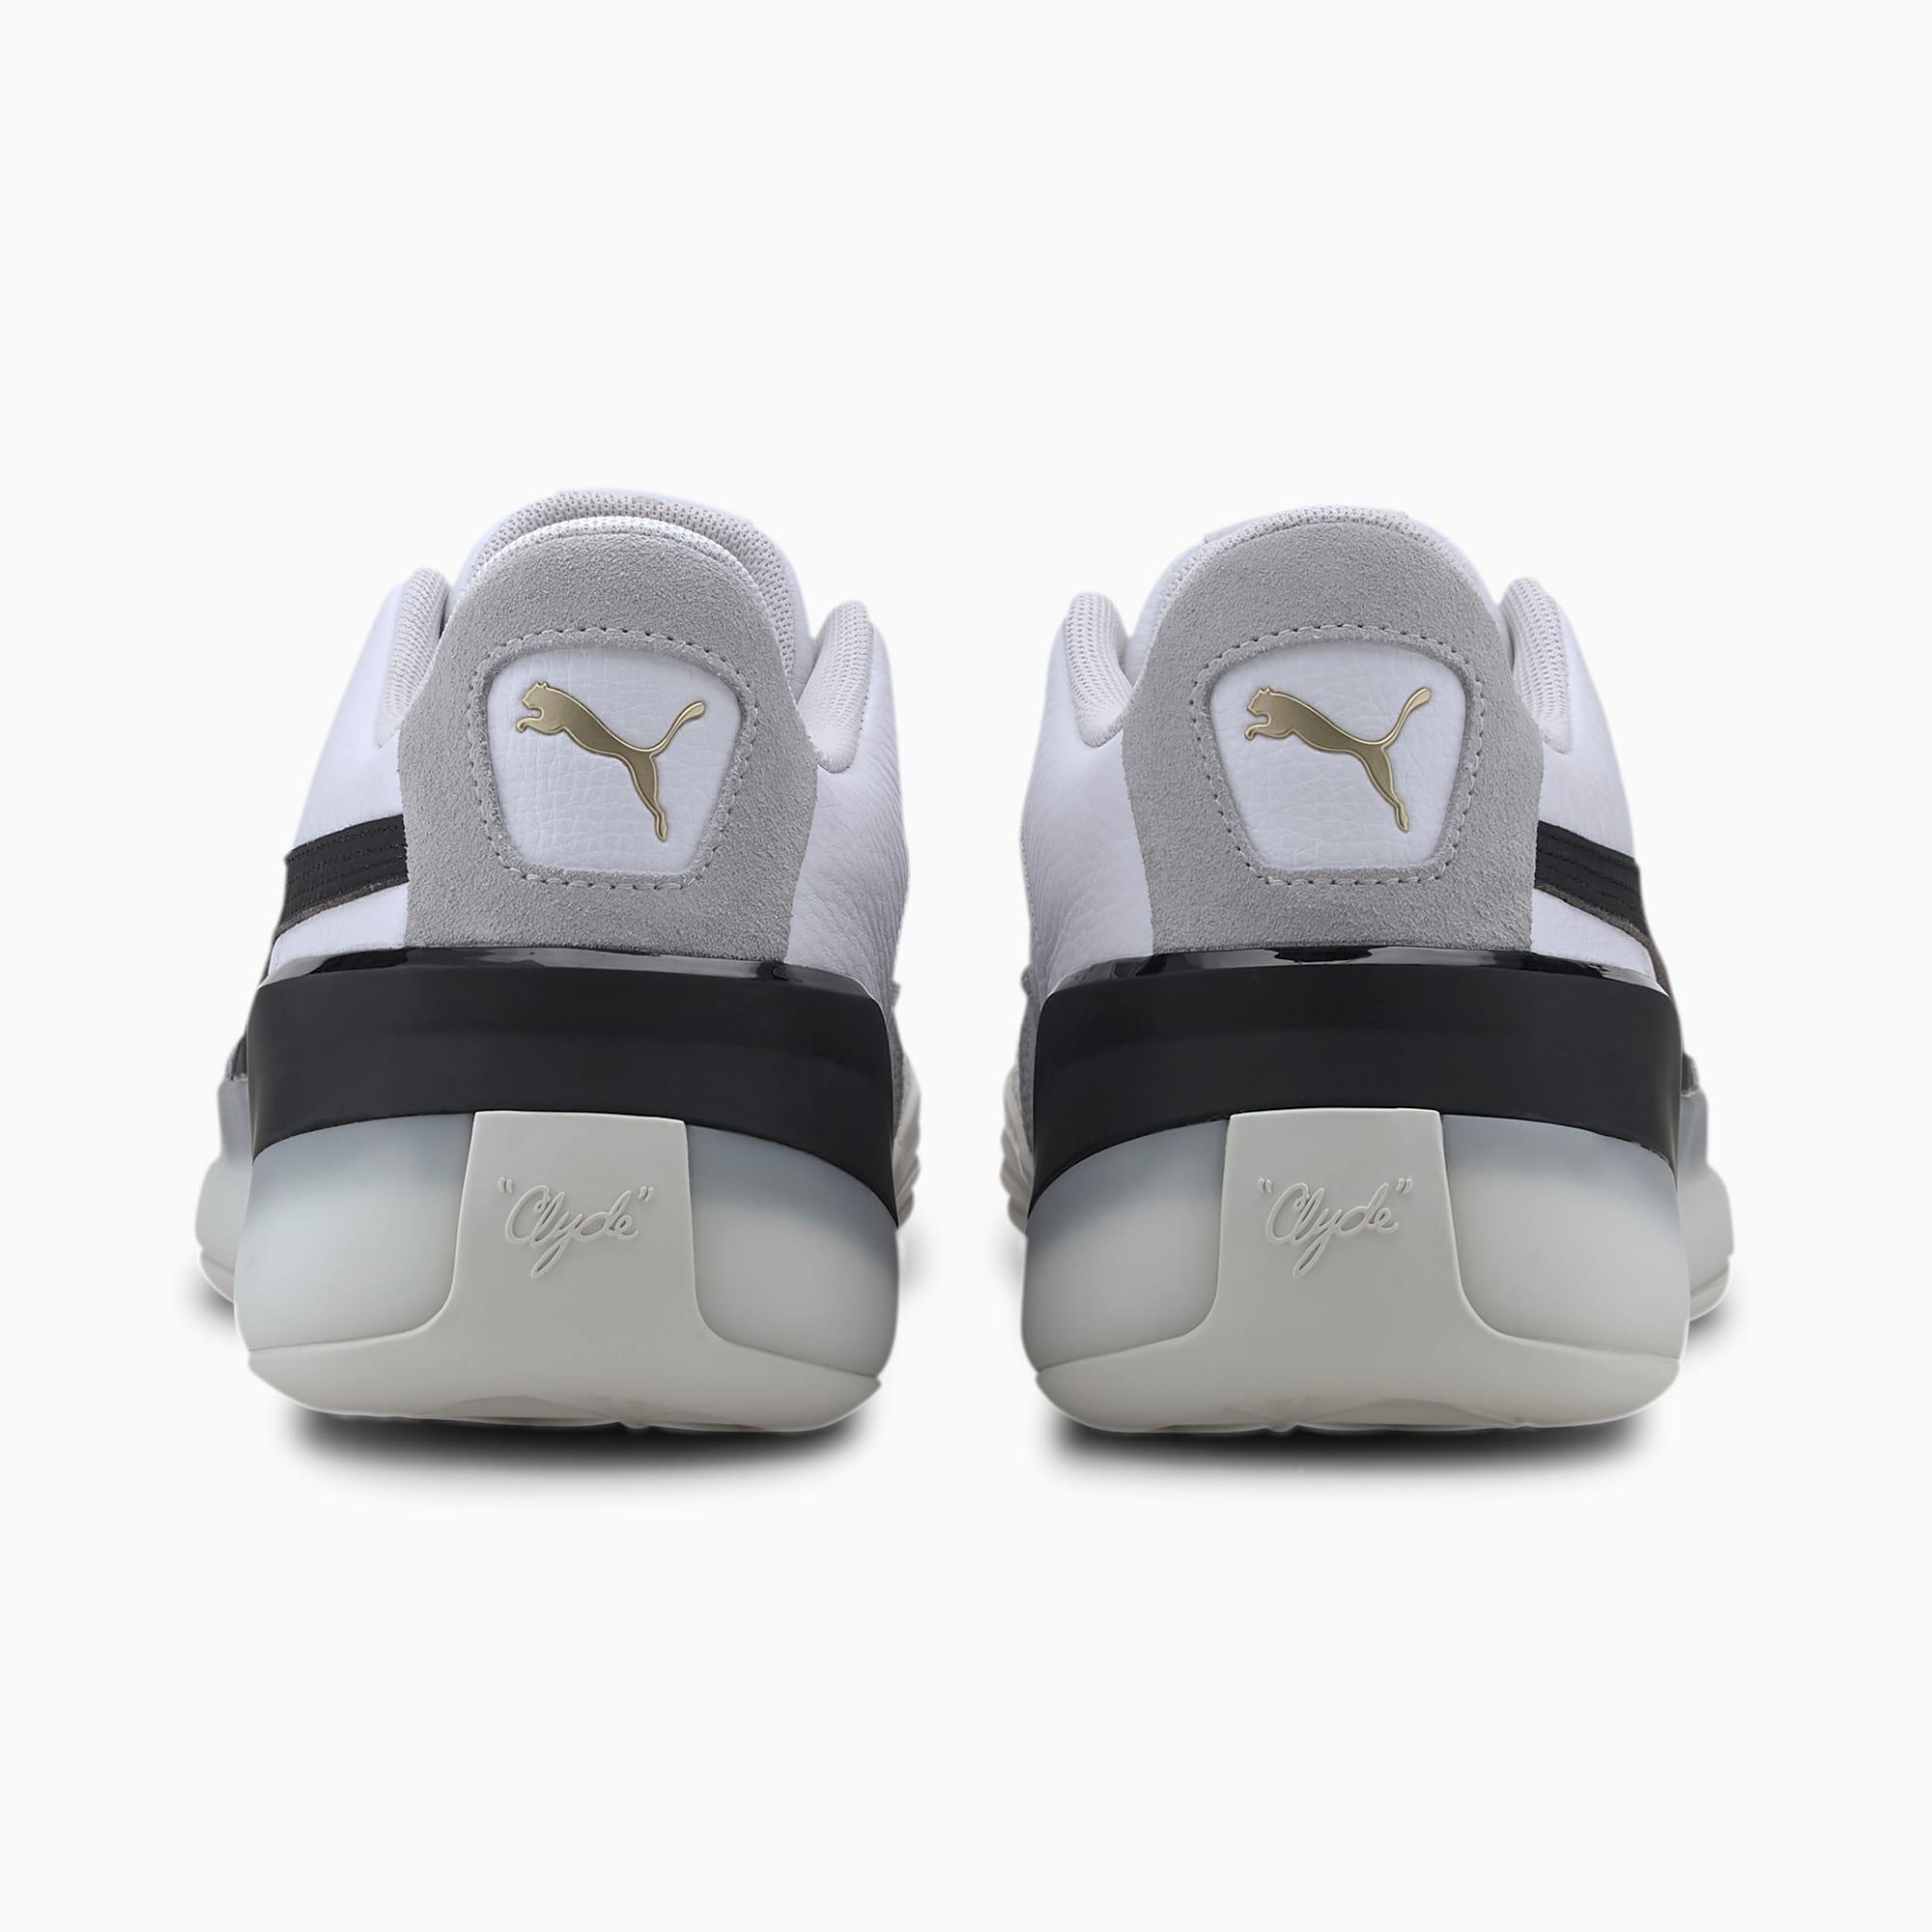 Salida hacia taburete el fin  Clyde Hardwood Basketball Shoes | PUMA US